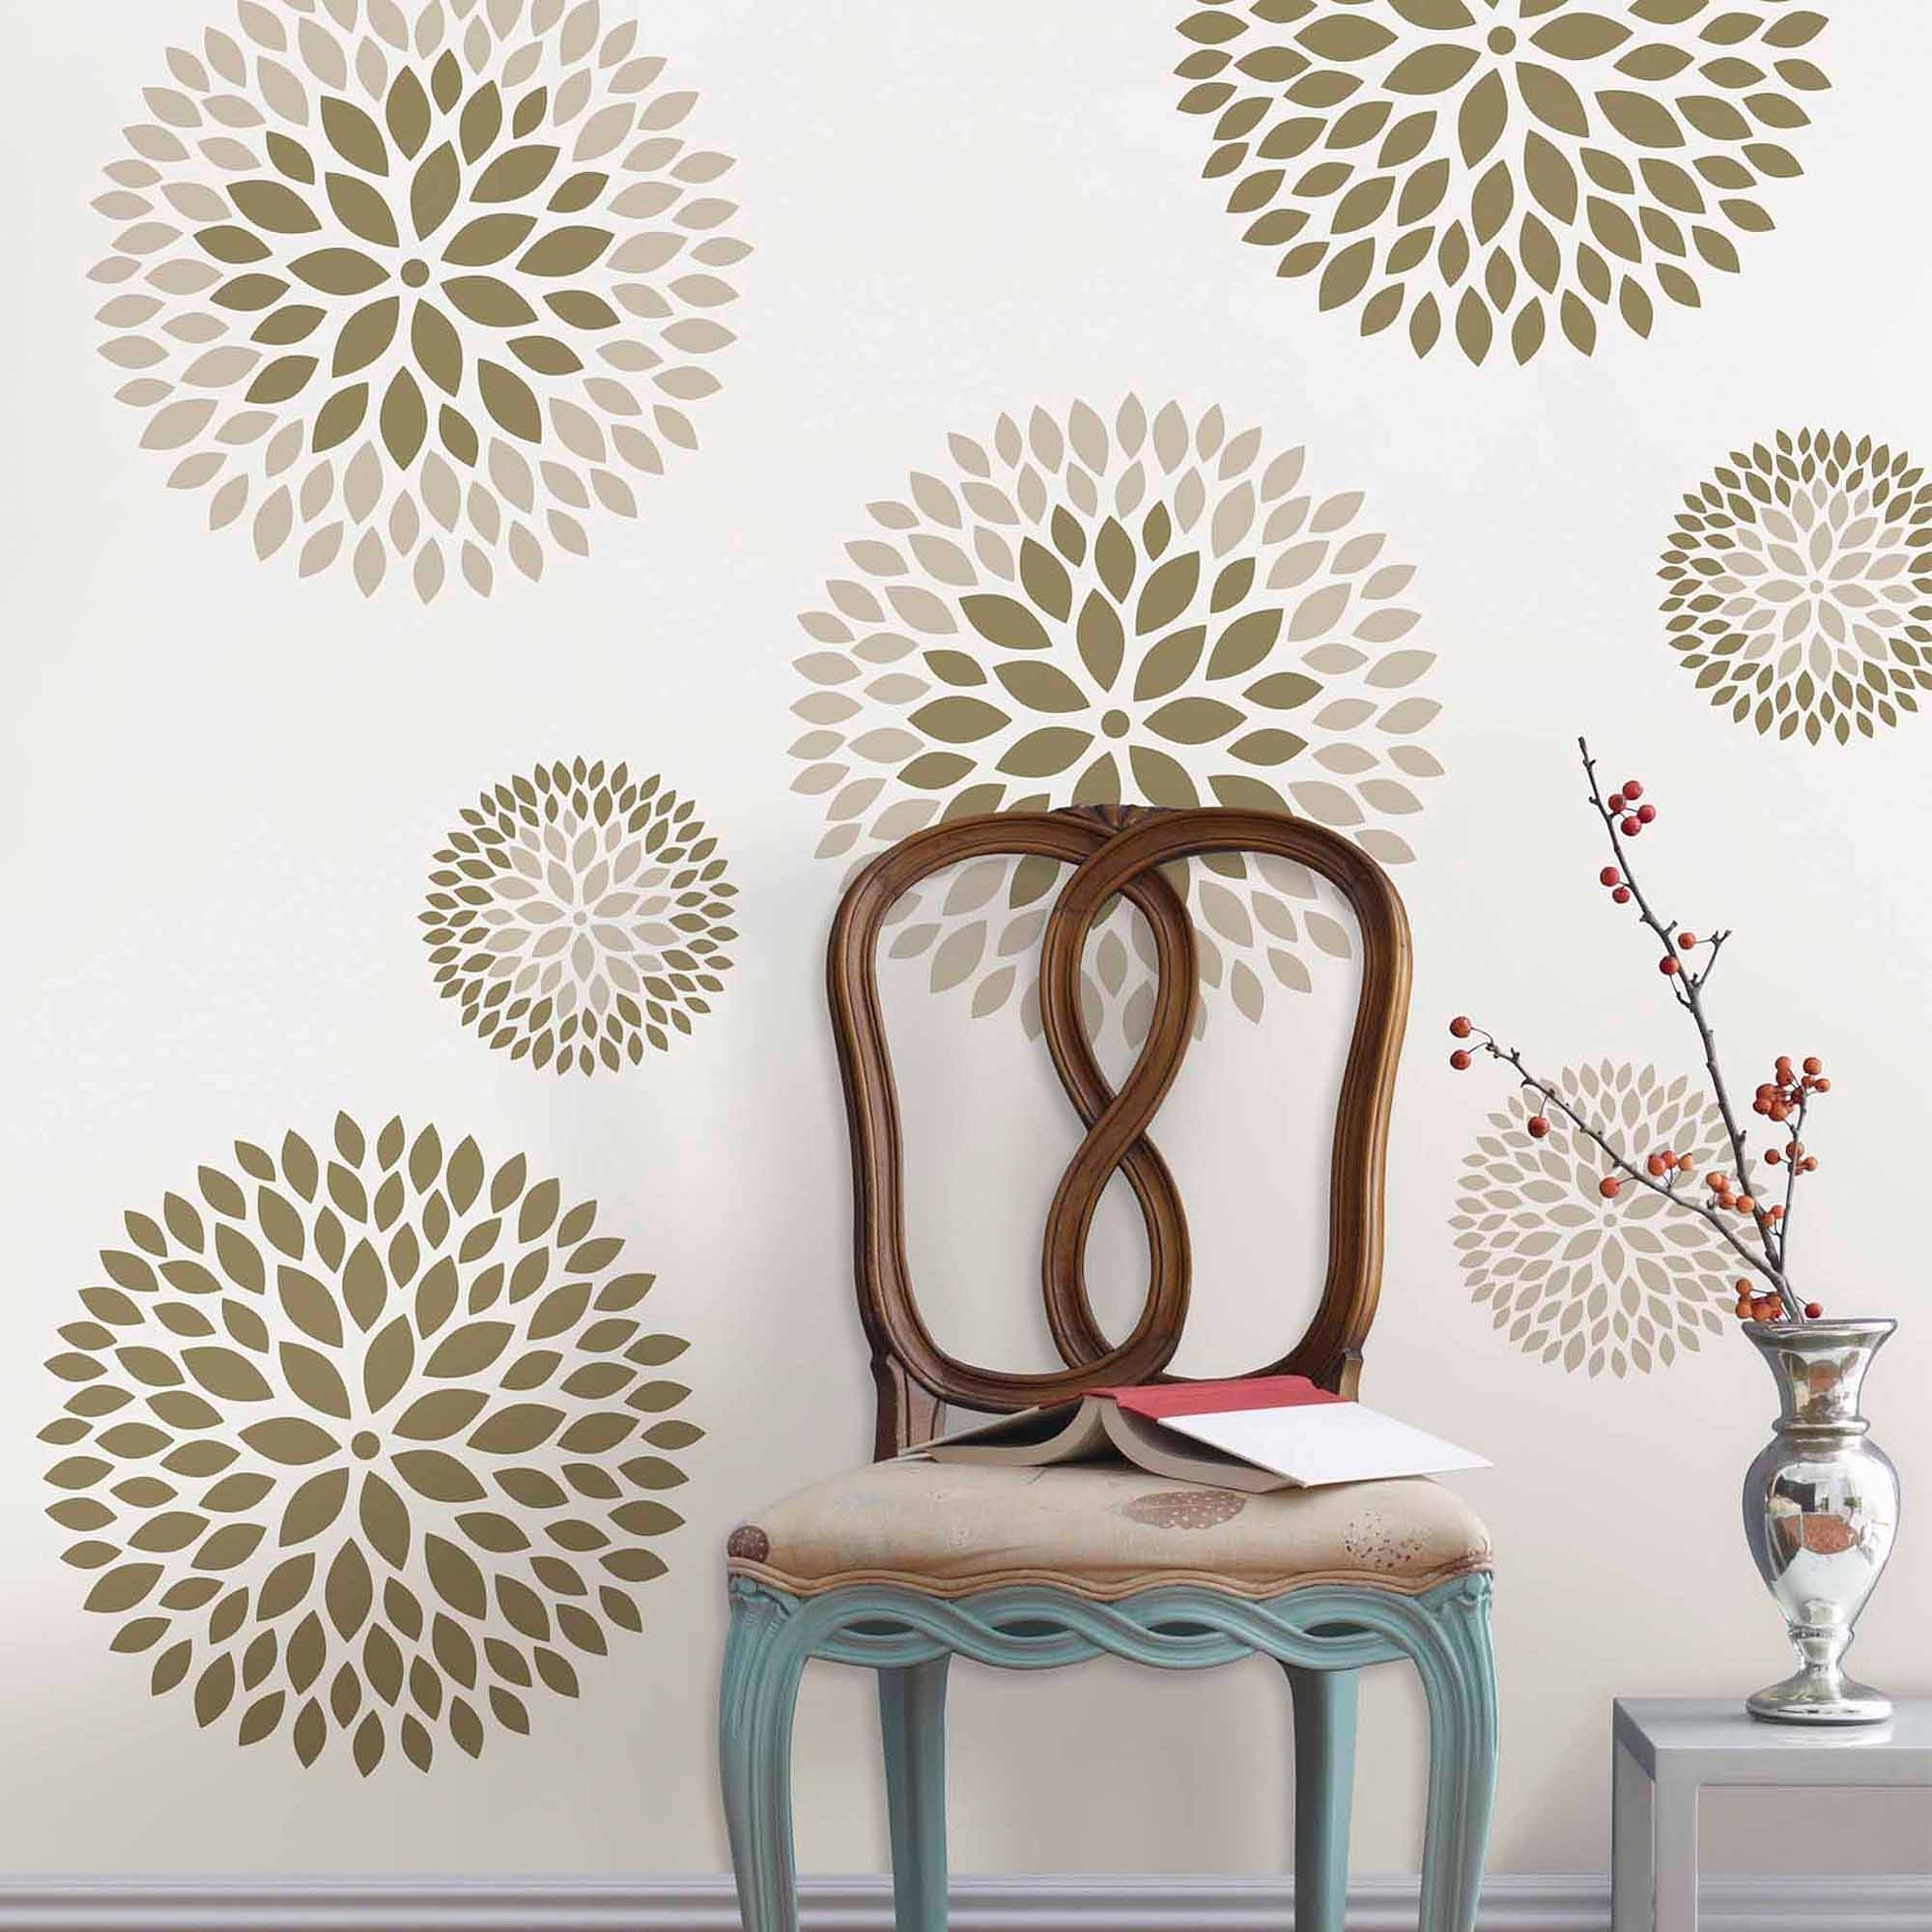 Fashionable Wallpops Chrysanthemum Wall Art Decals Kit – Walmart Pertaining To Wall Art At Walmart (View 6 of 20)